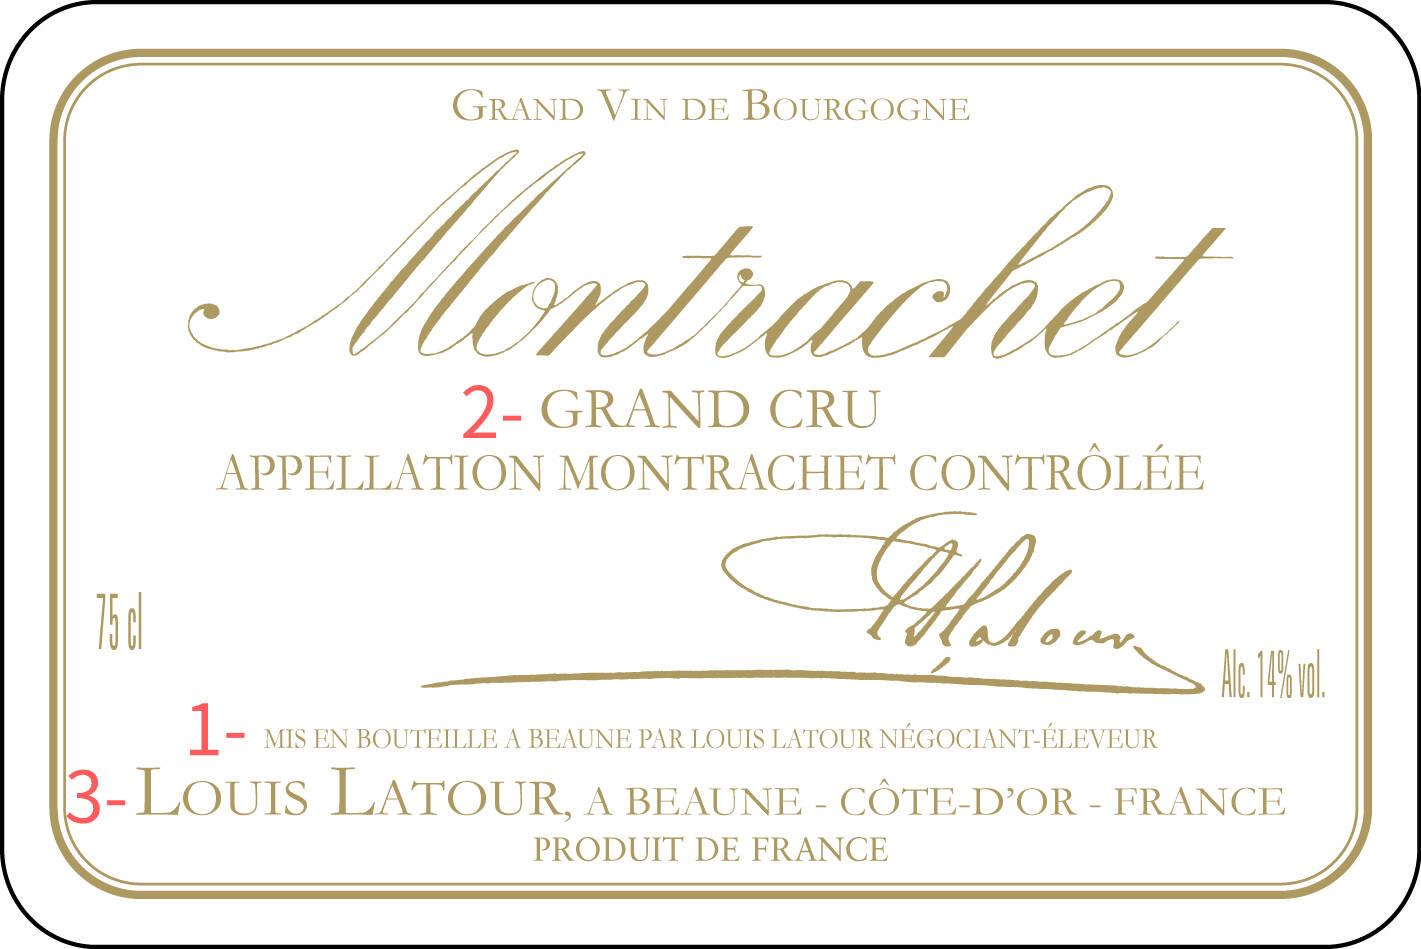 montrachet-grand-cru-etiquette-jpg (1) (1).jpg